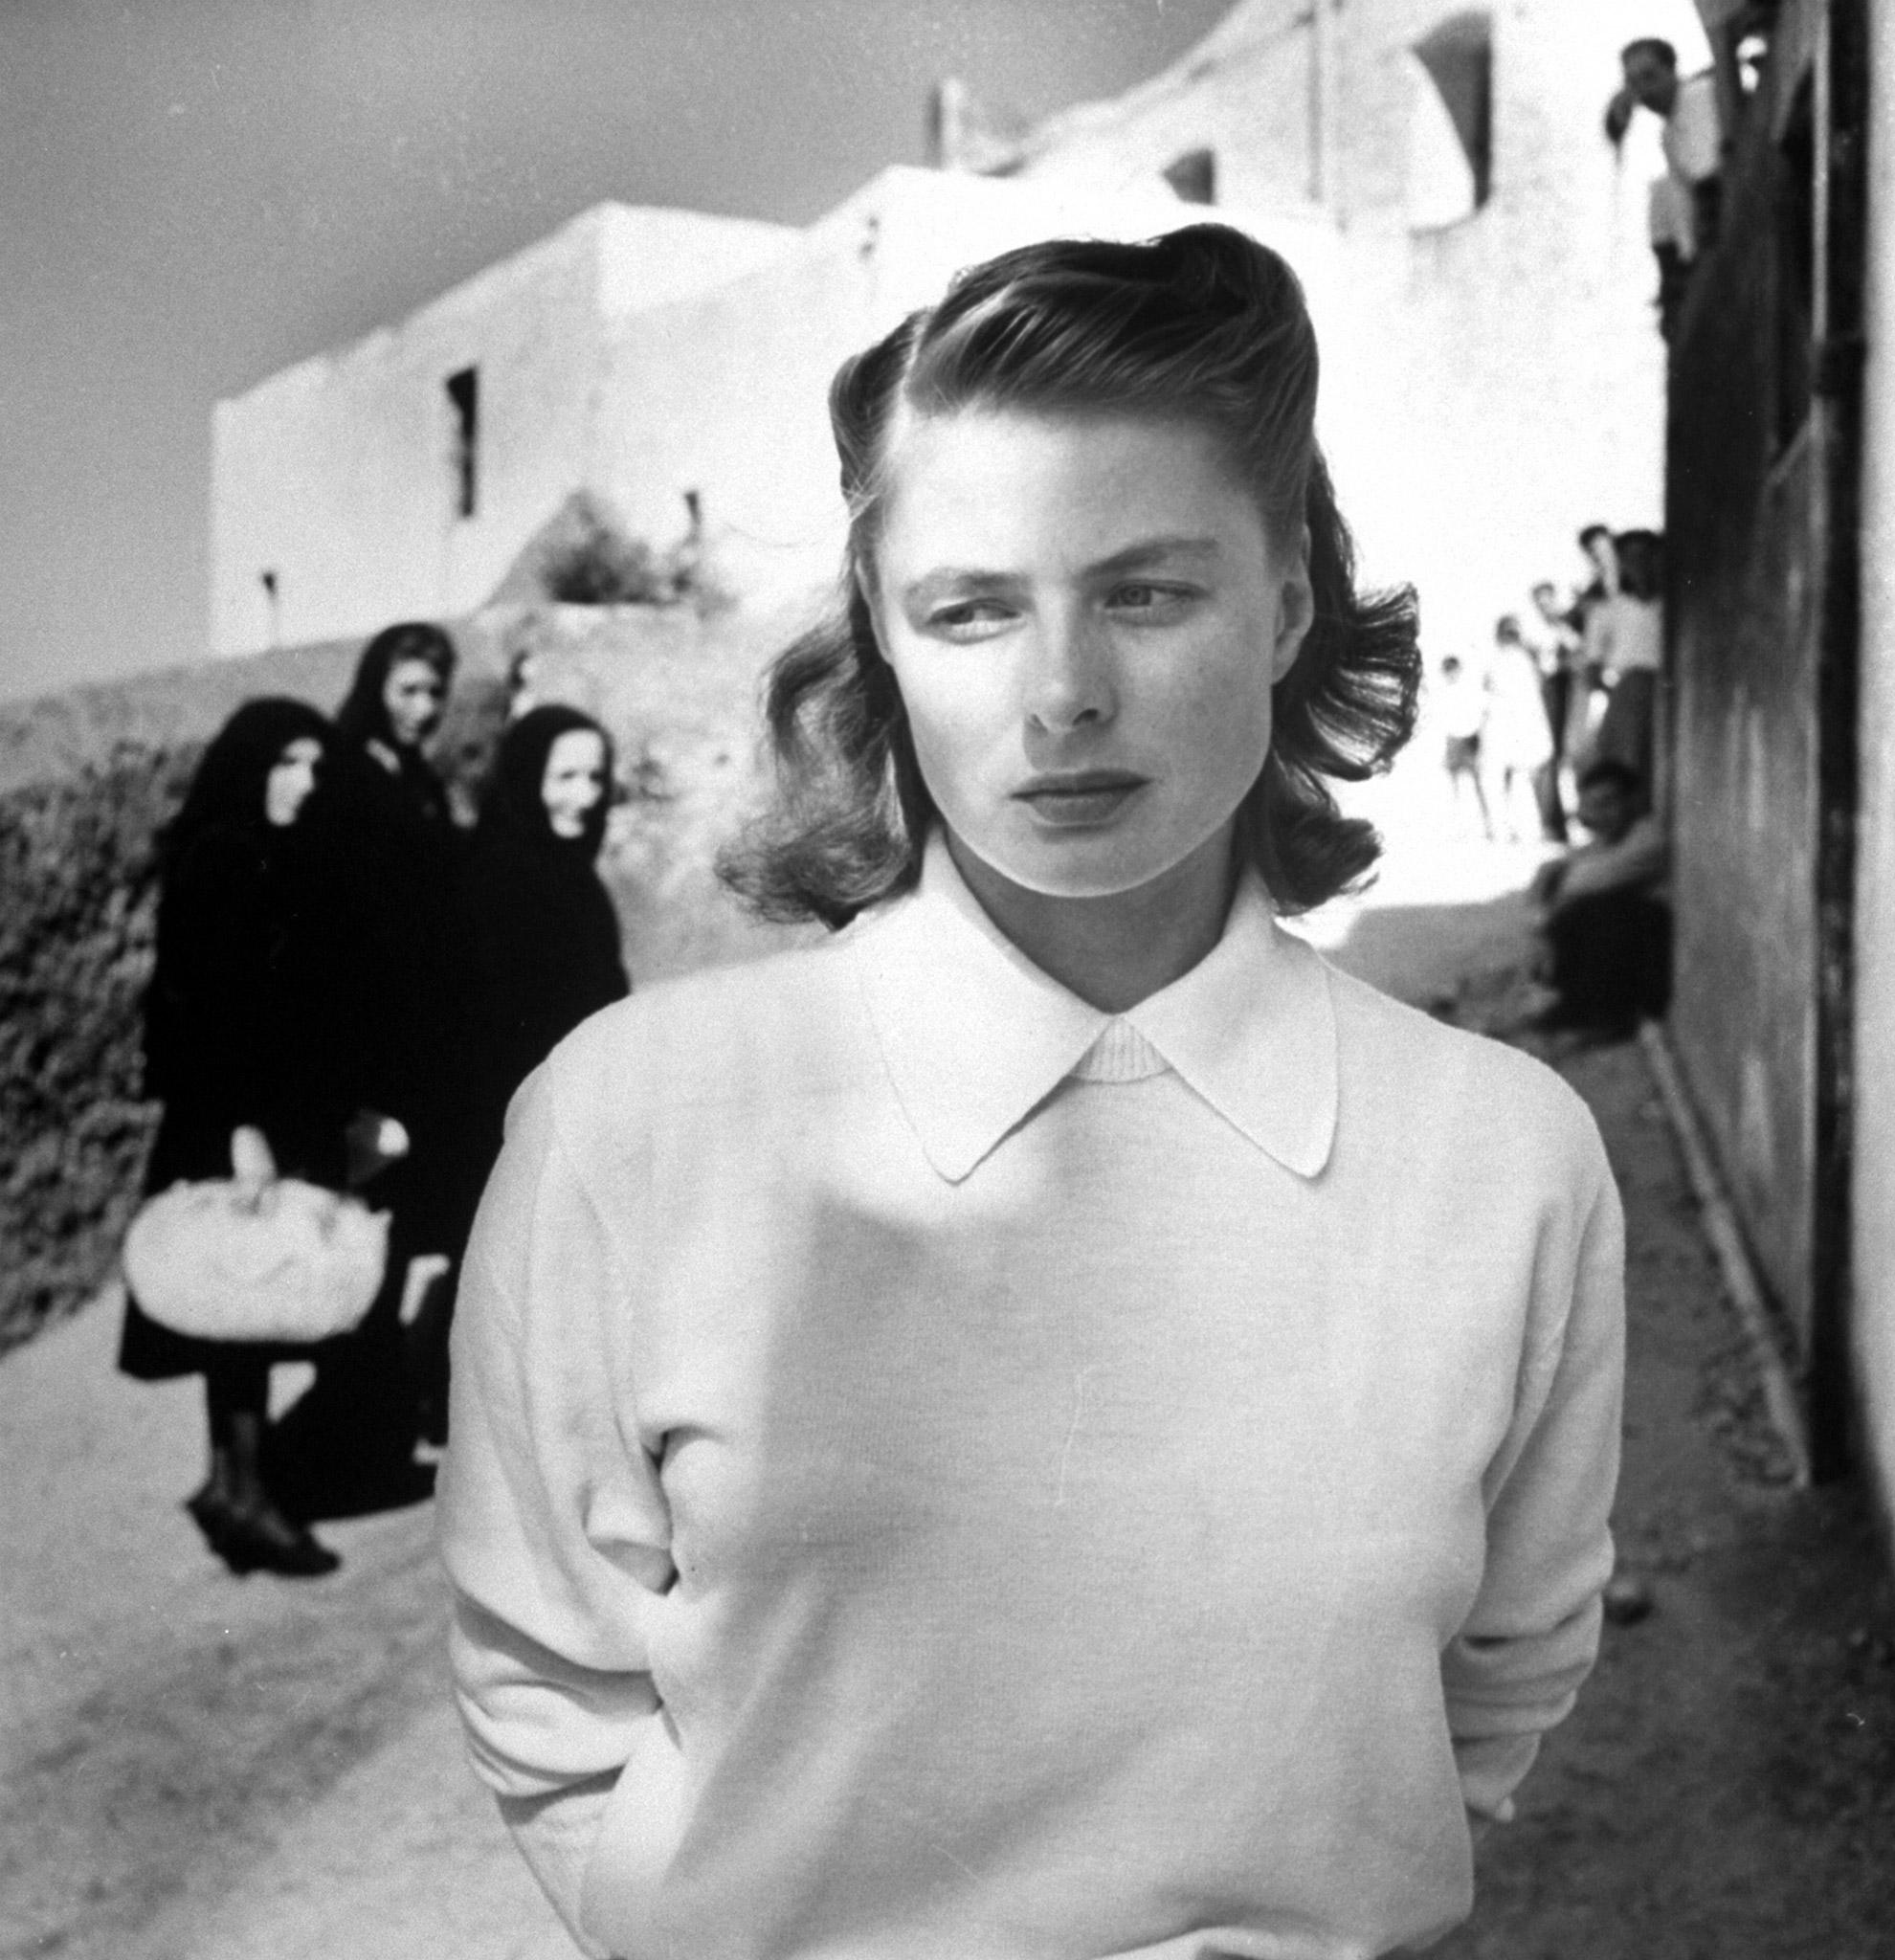 Ingrid Bergman on location for the film Stromboli, in 1949.